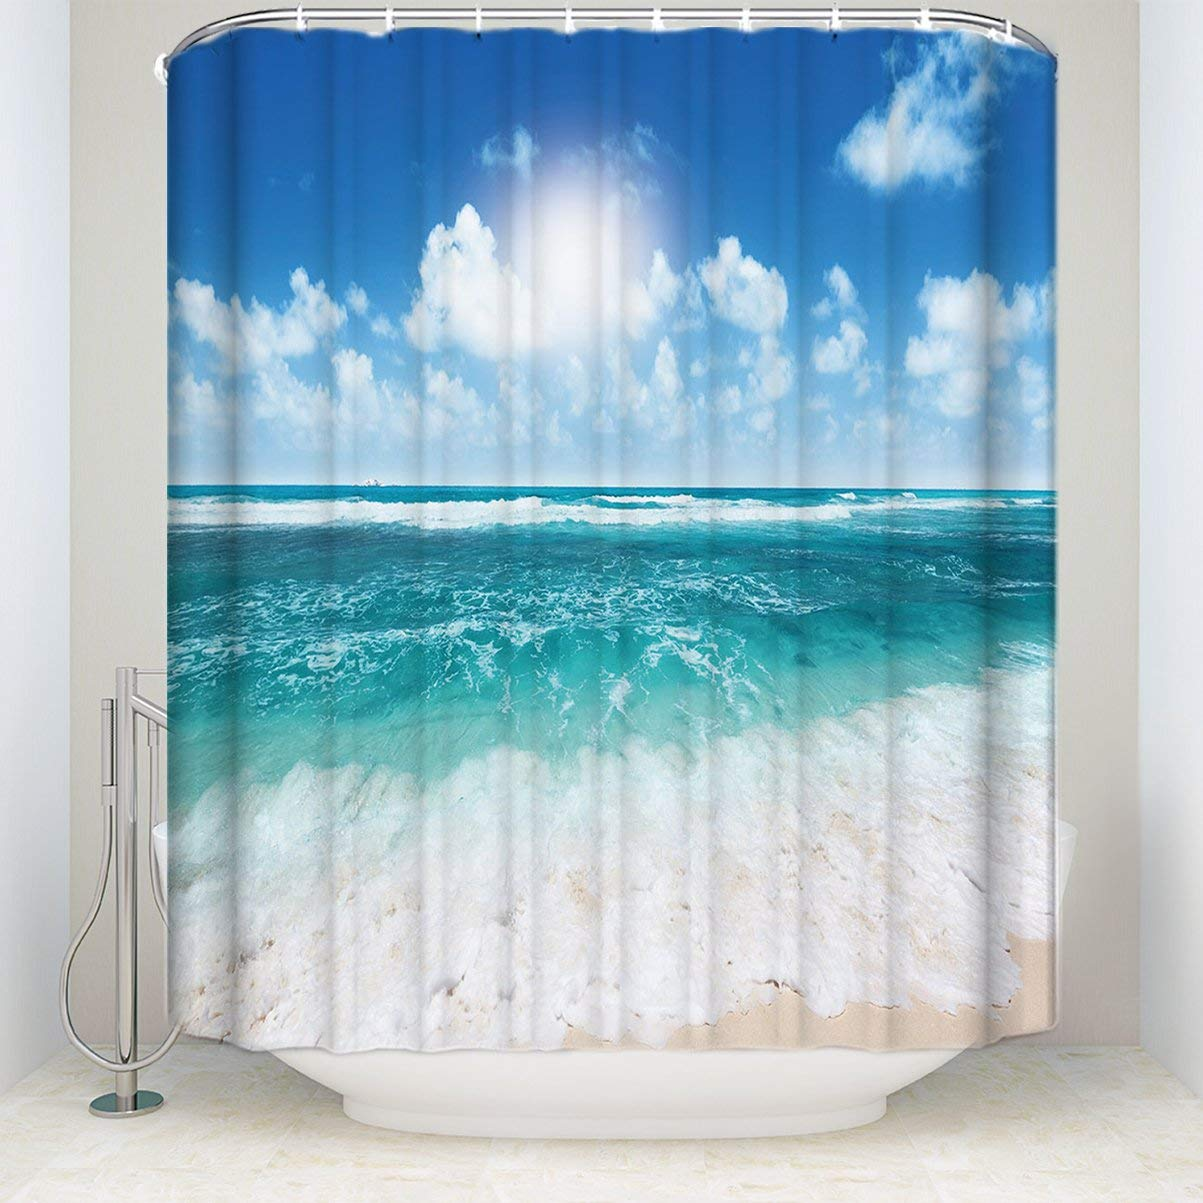 72x72 Bathroom Waterproof Shower Curtain 12 Hooks Starfish